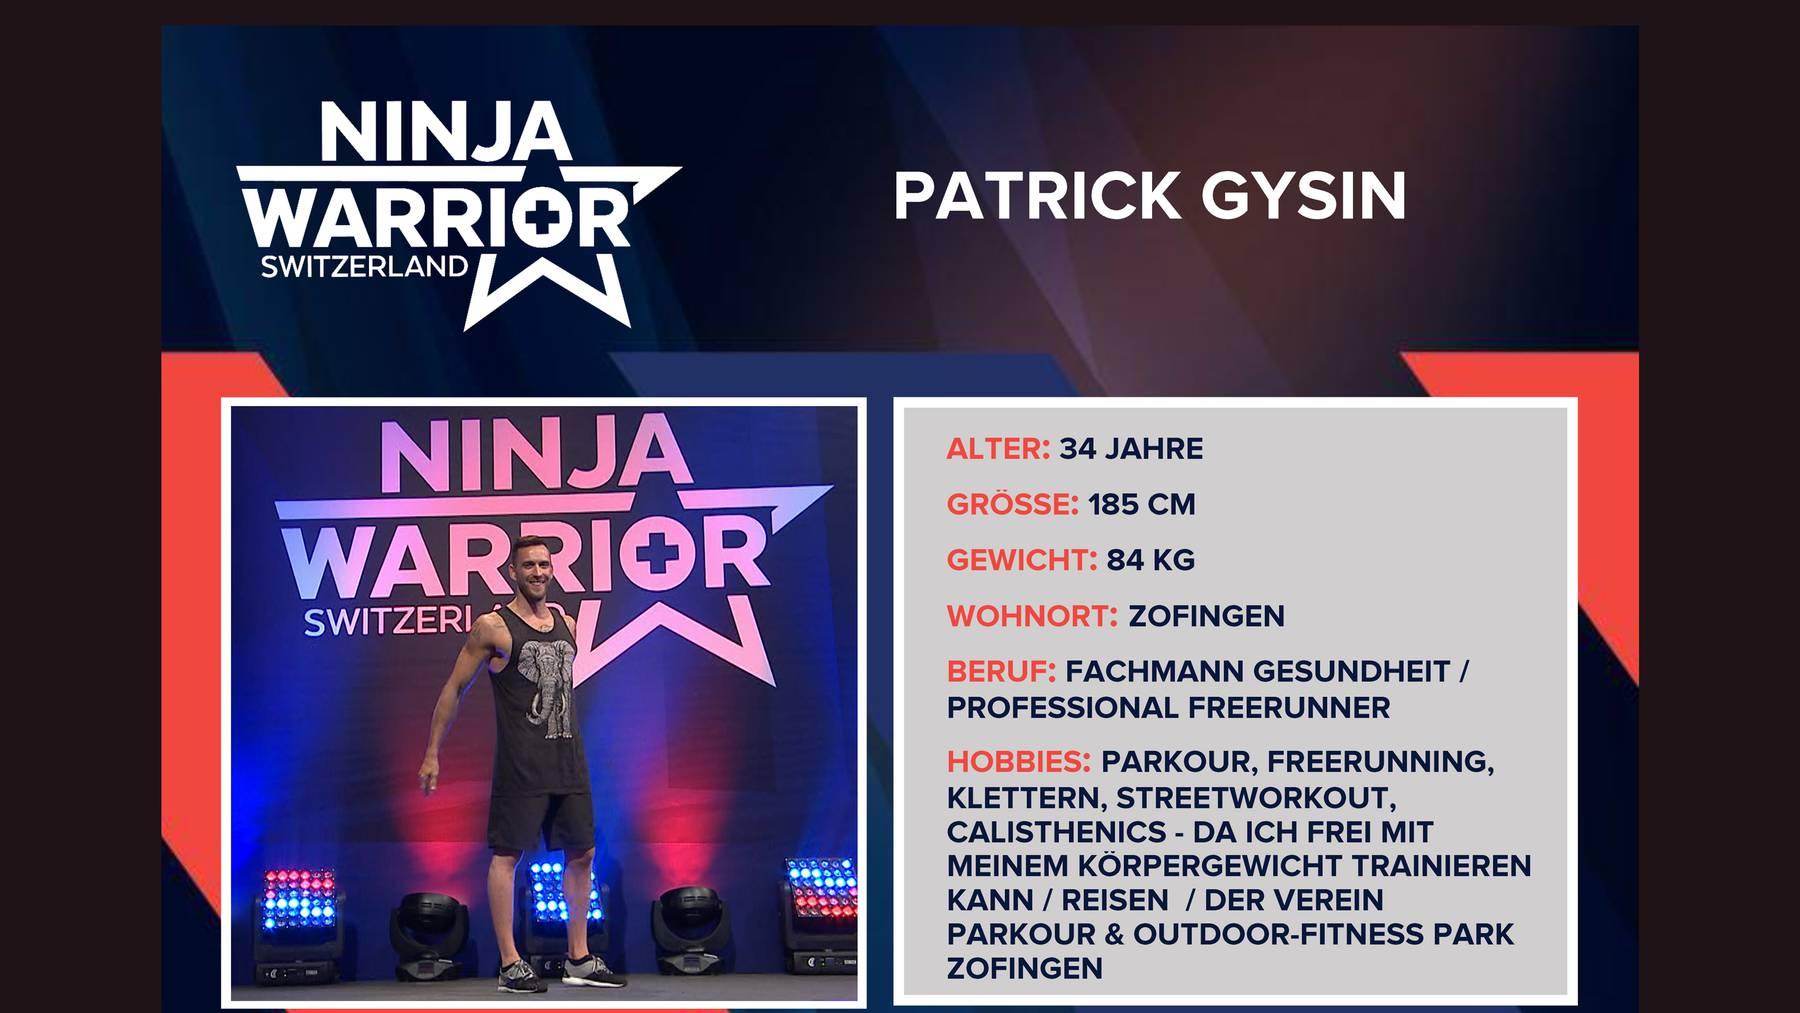 Patrick Gysin